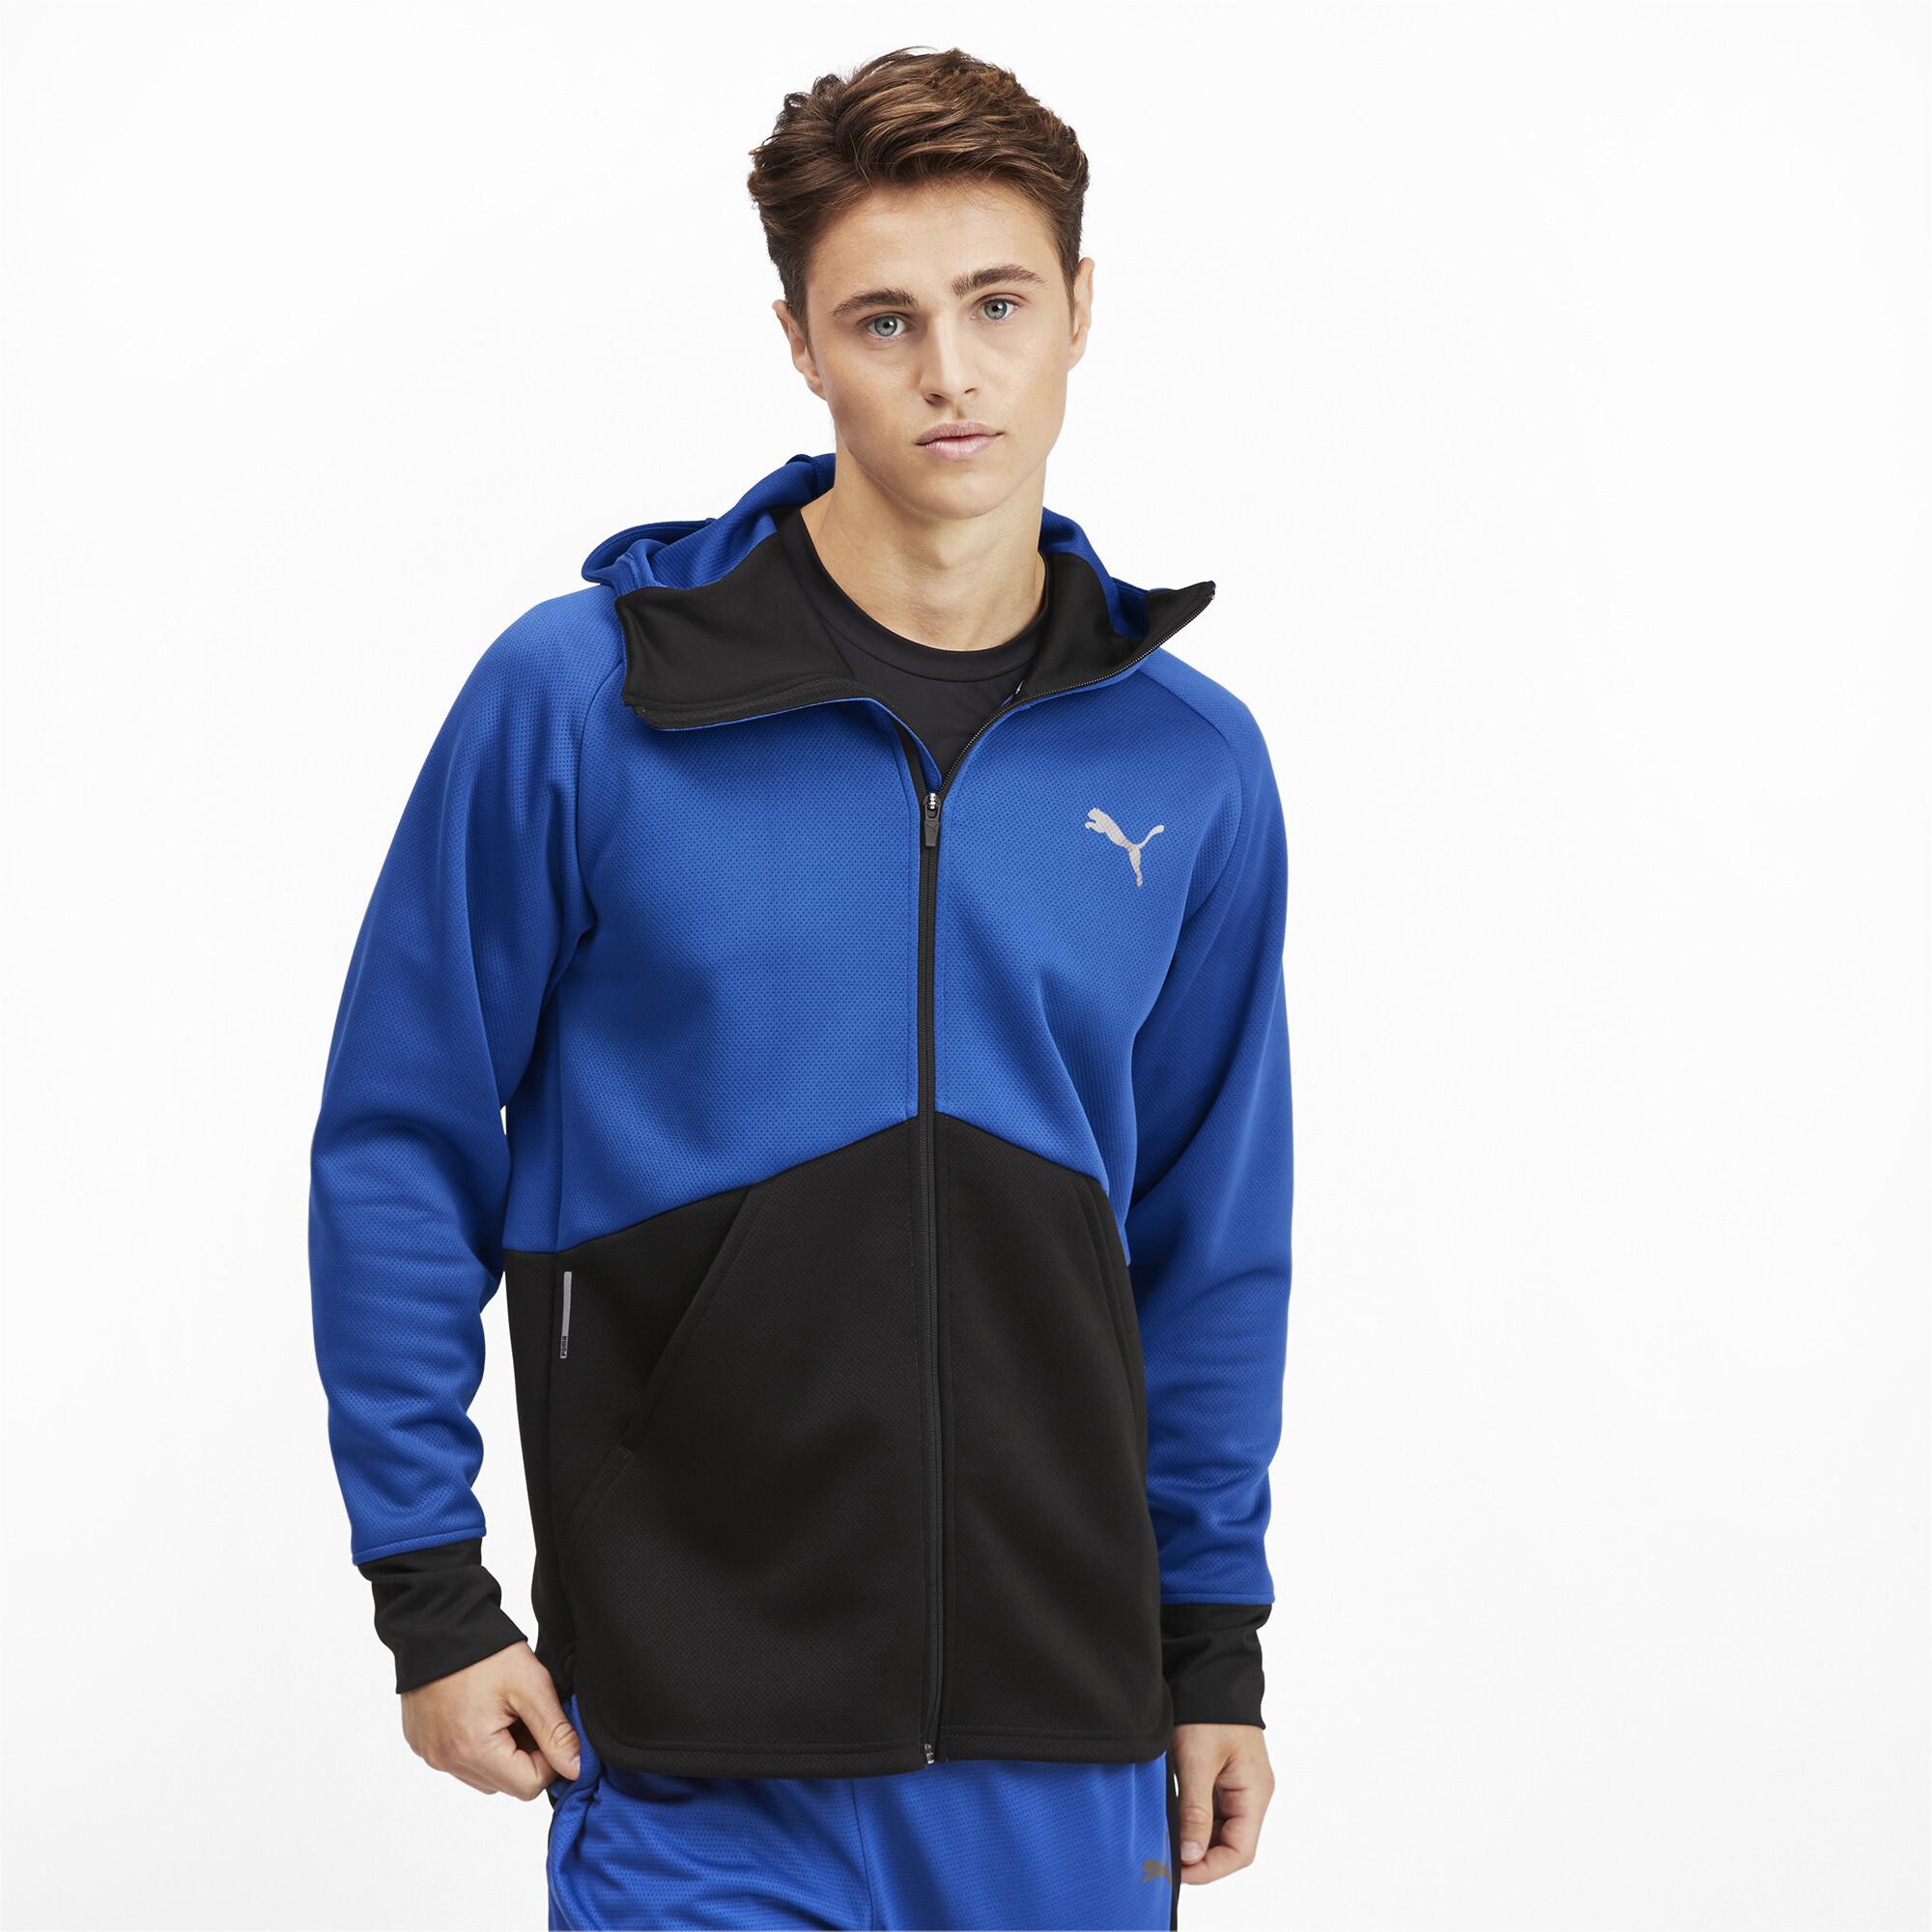 PUMA-Power-BND-Men-039-s-Jacket-Men-Knitted-Jacket-Training thumbnail 4